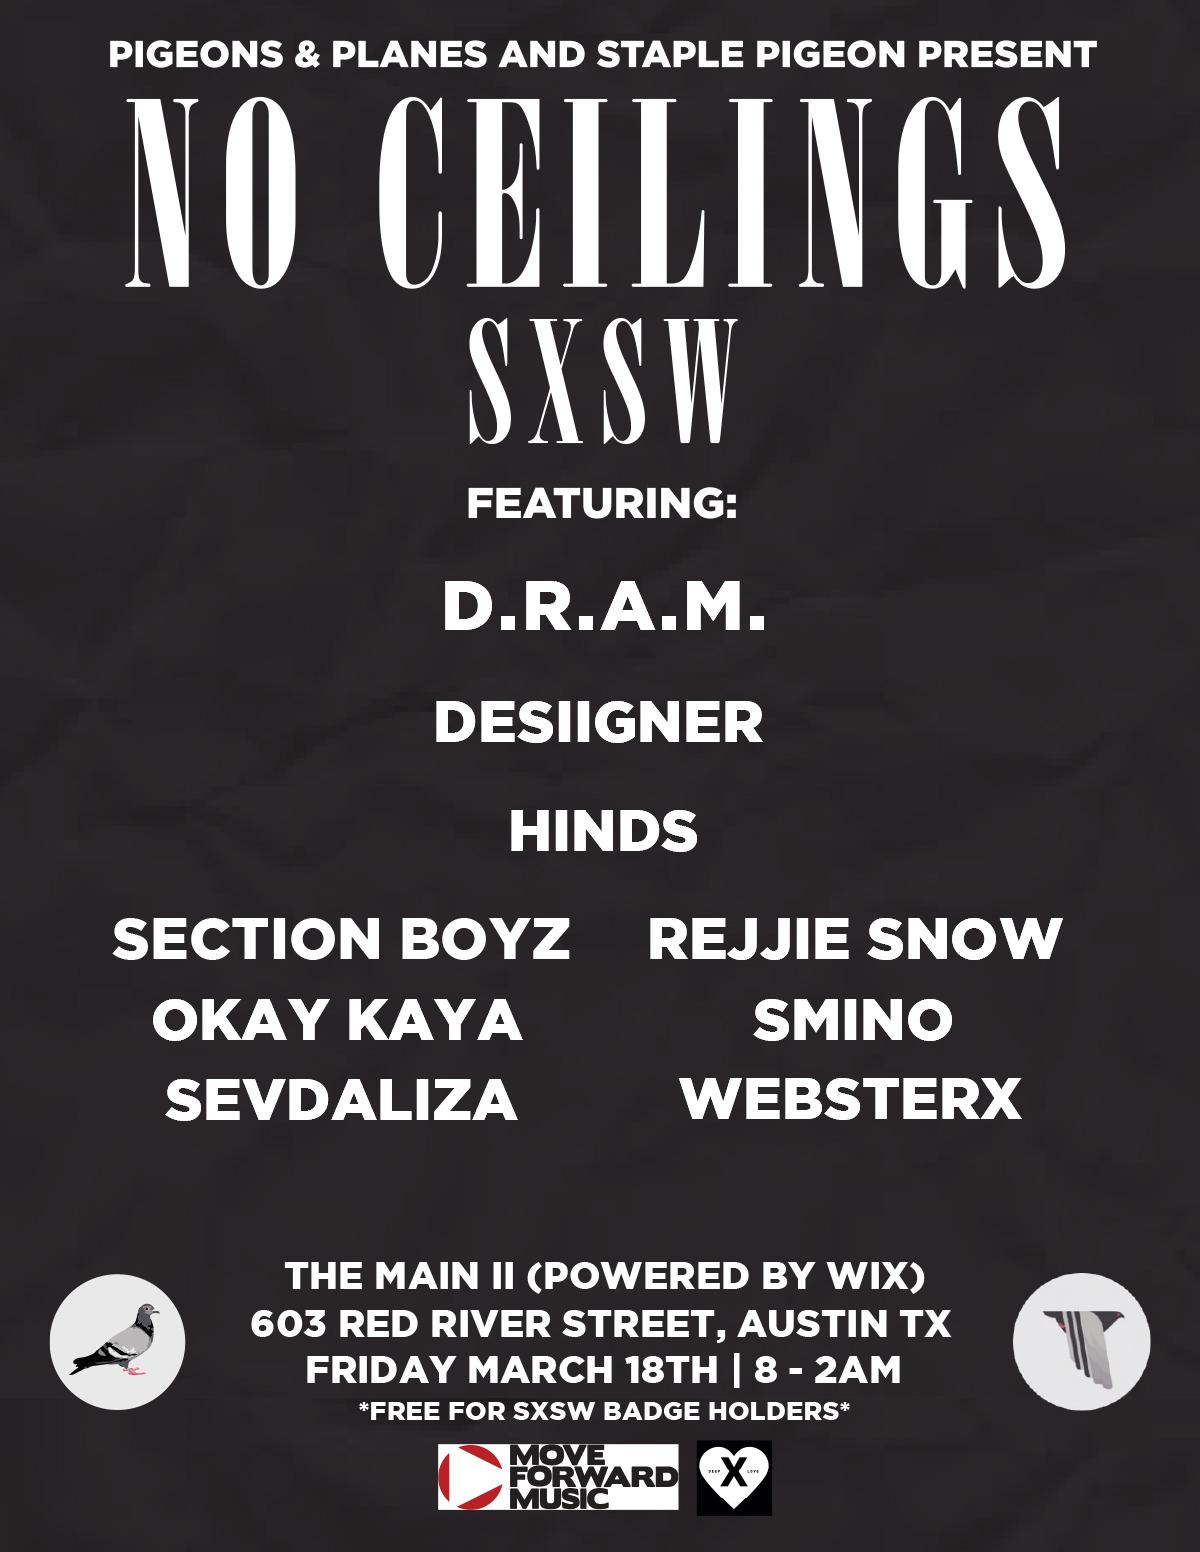 No-ceilings-SXSWfinalfinal.jpg